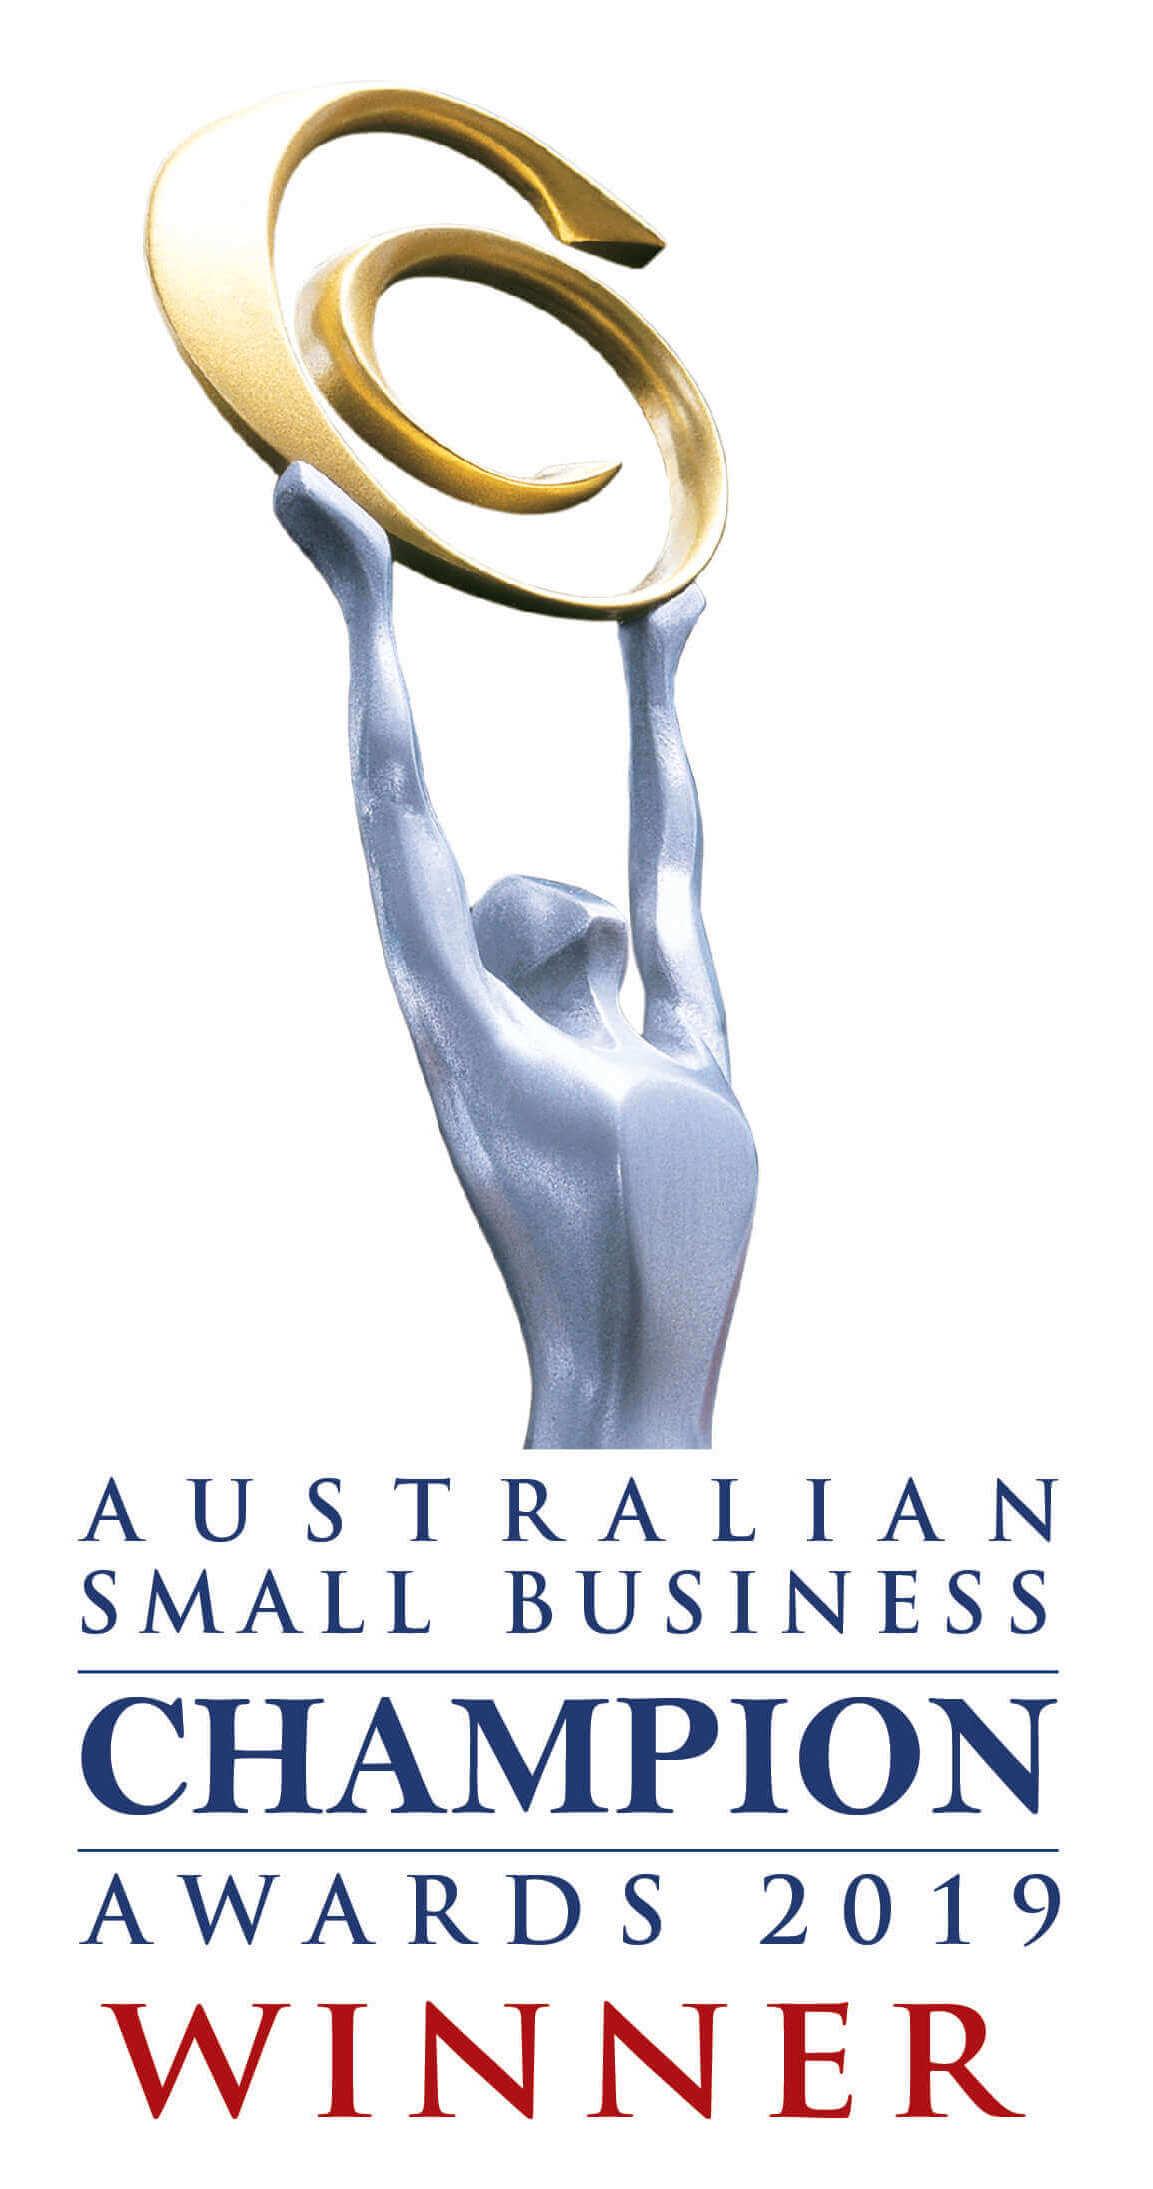 Small Business Award Winner 2019